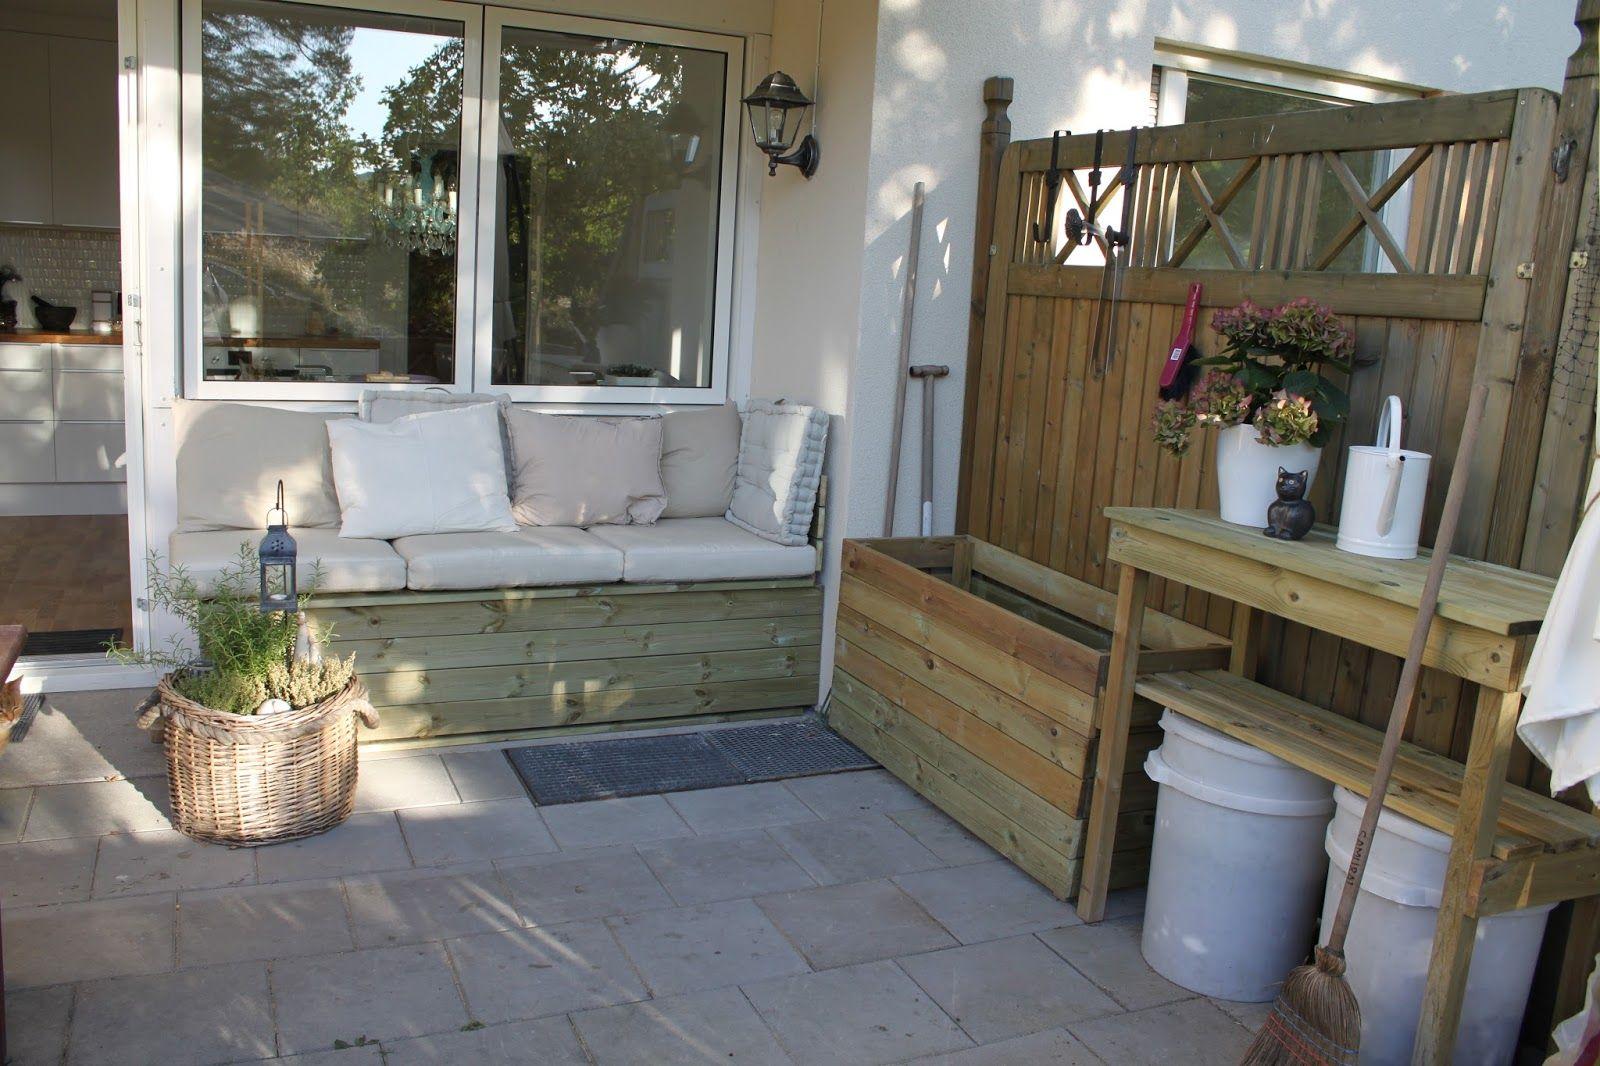 Inredning trall till balkong : platsbyggd soffa balkong - Sök på Google | Balkongen | Pinterest ...